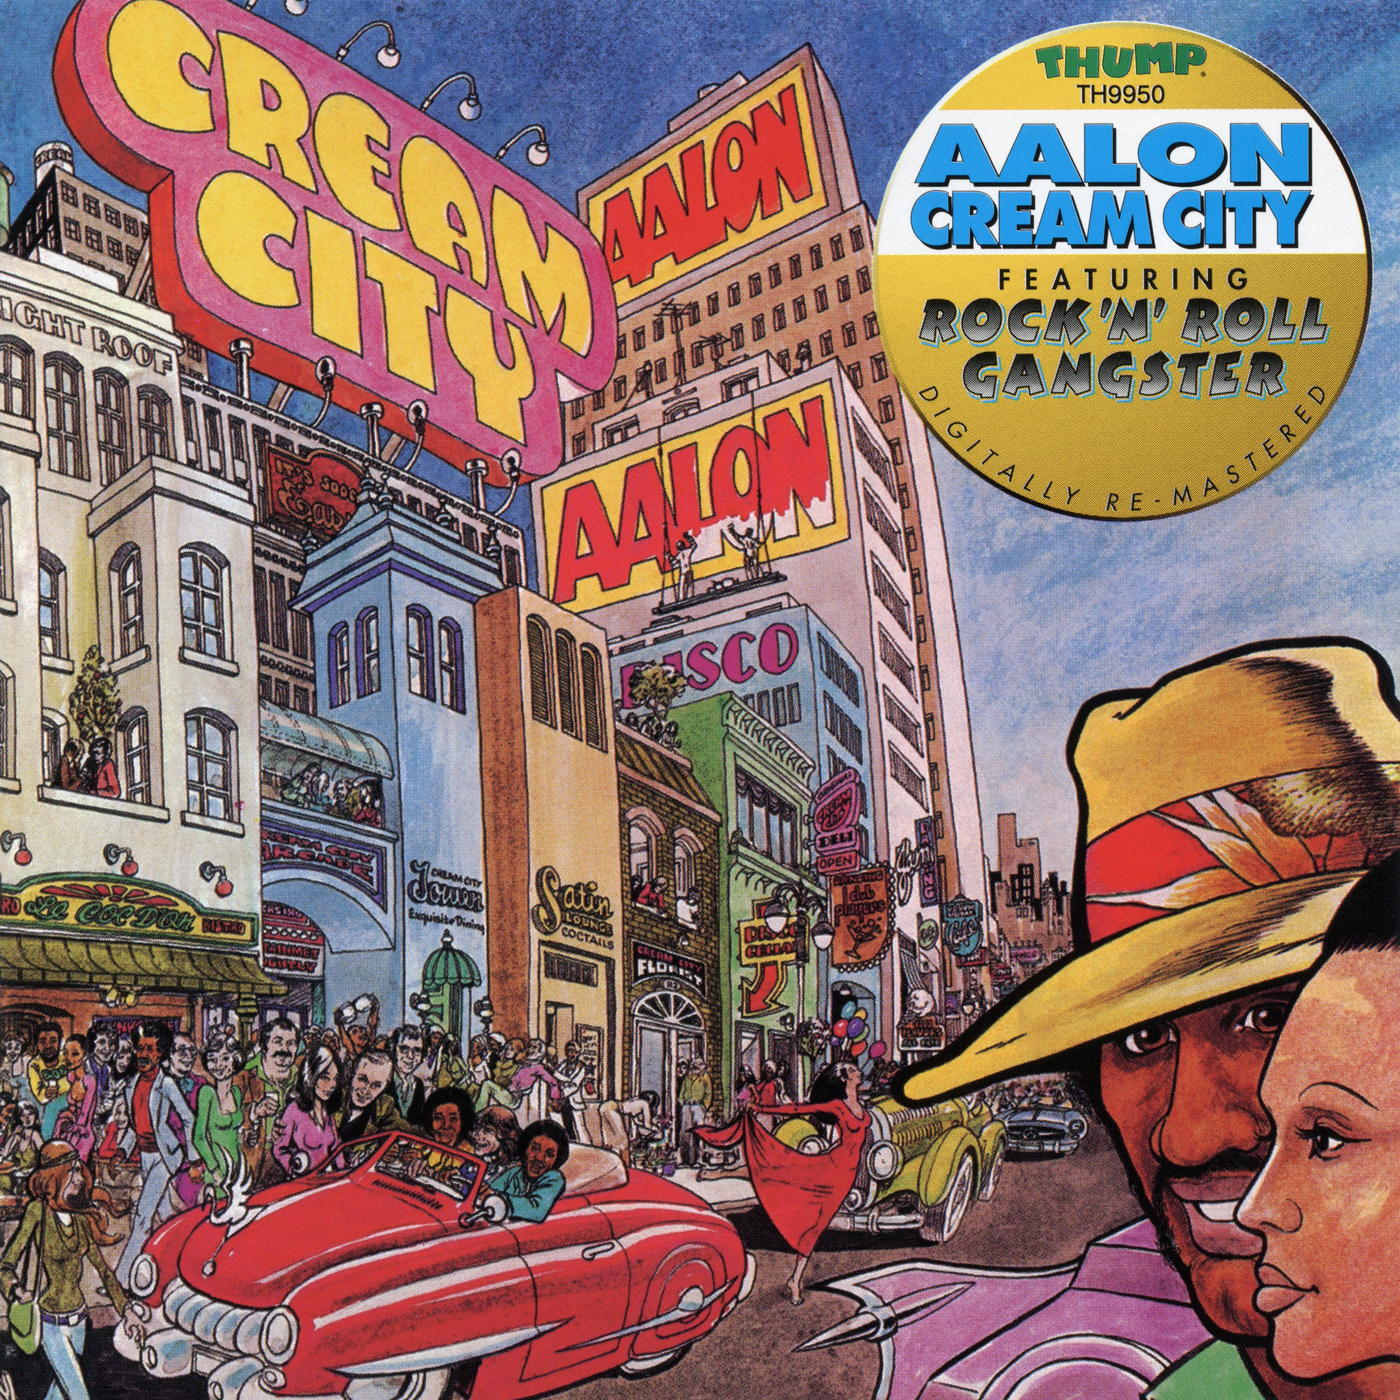 Cream City - Aalon